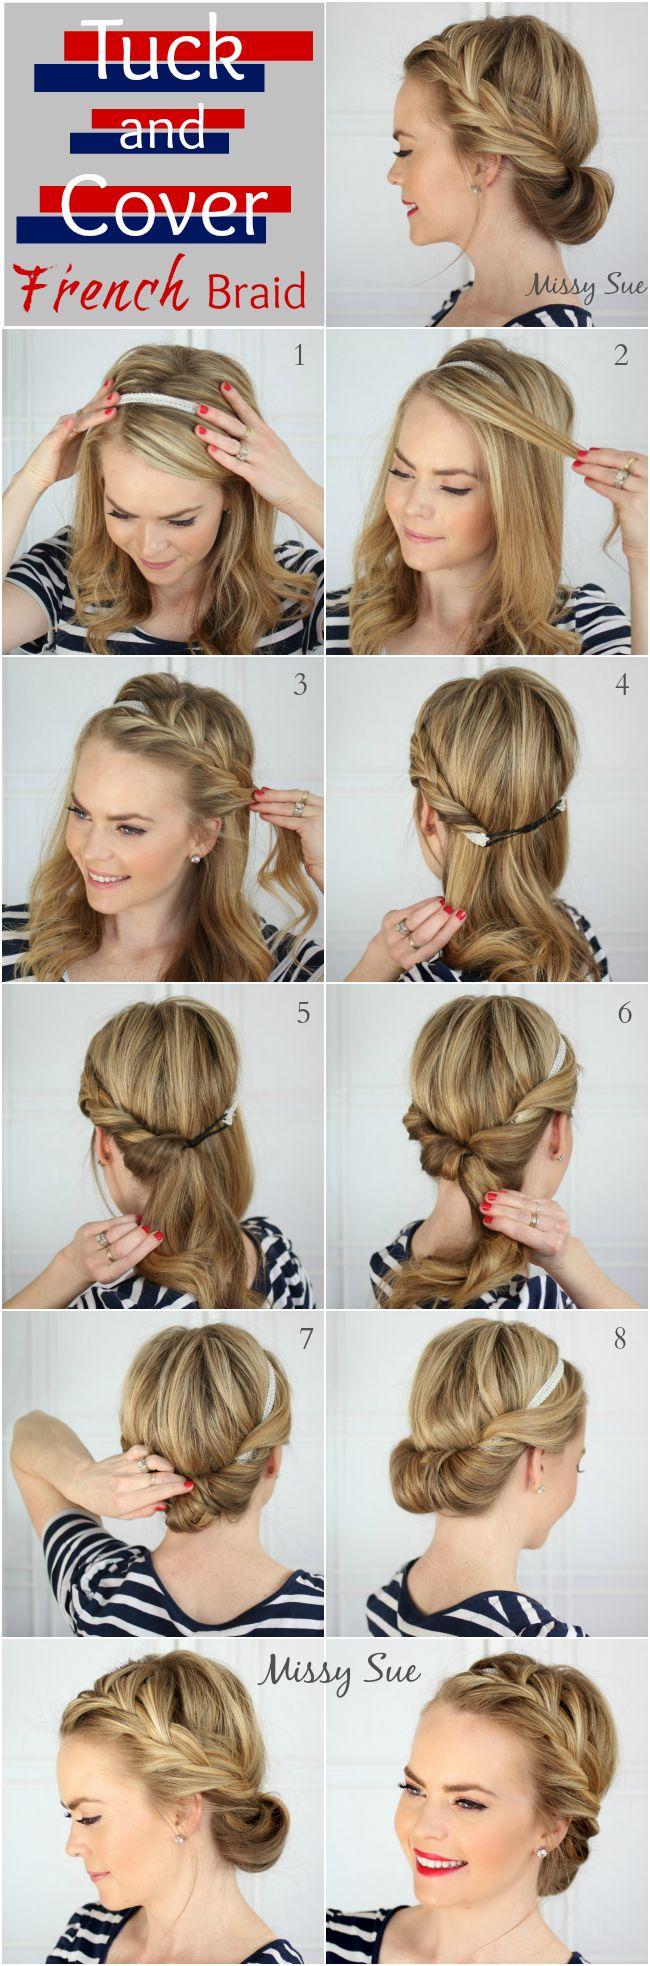 twisted Frech diy braid wedding hairstyles for long hair